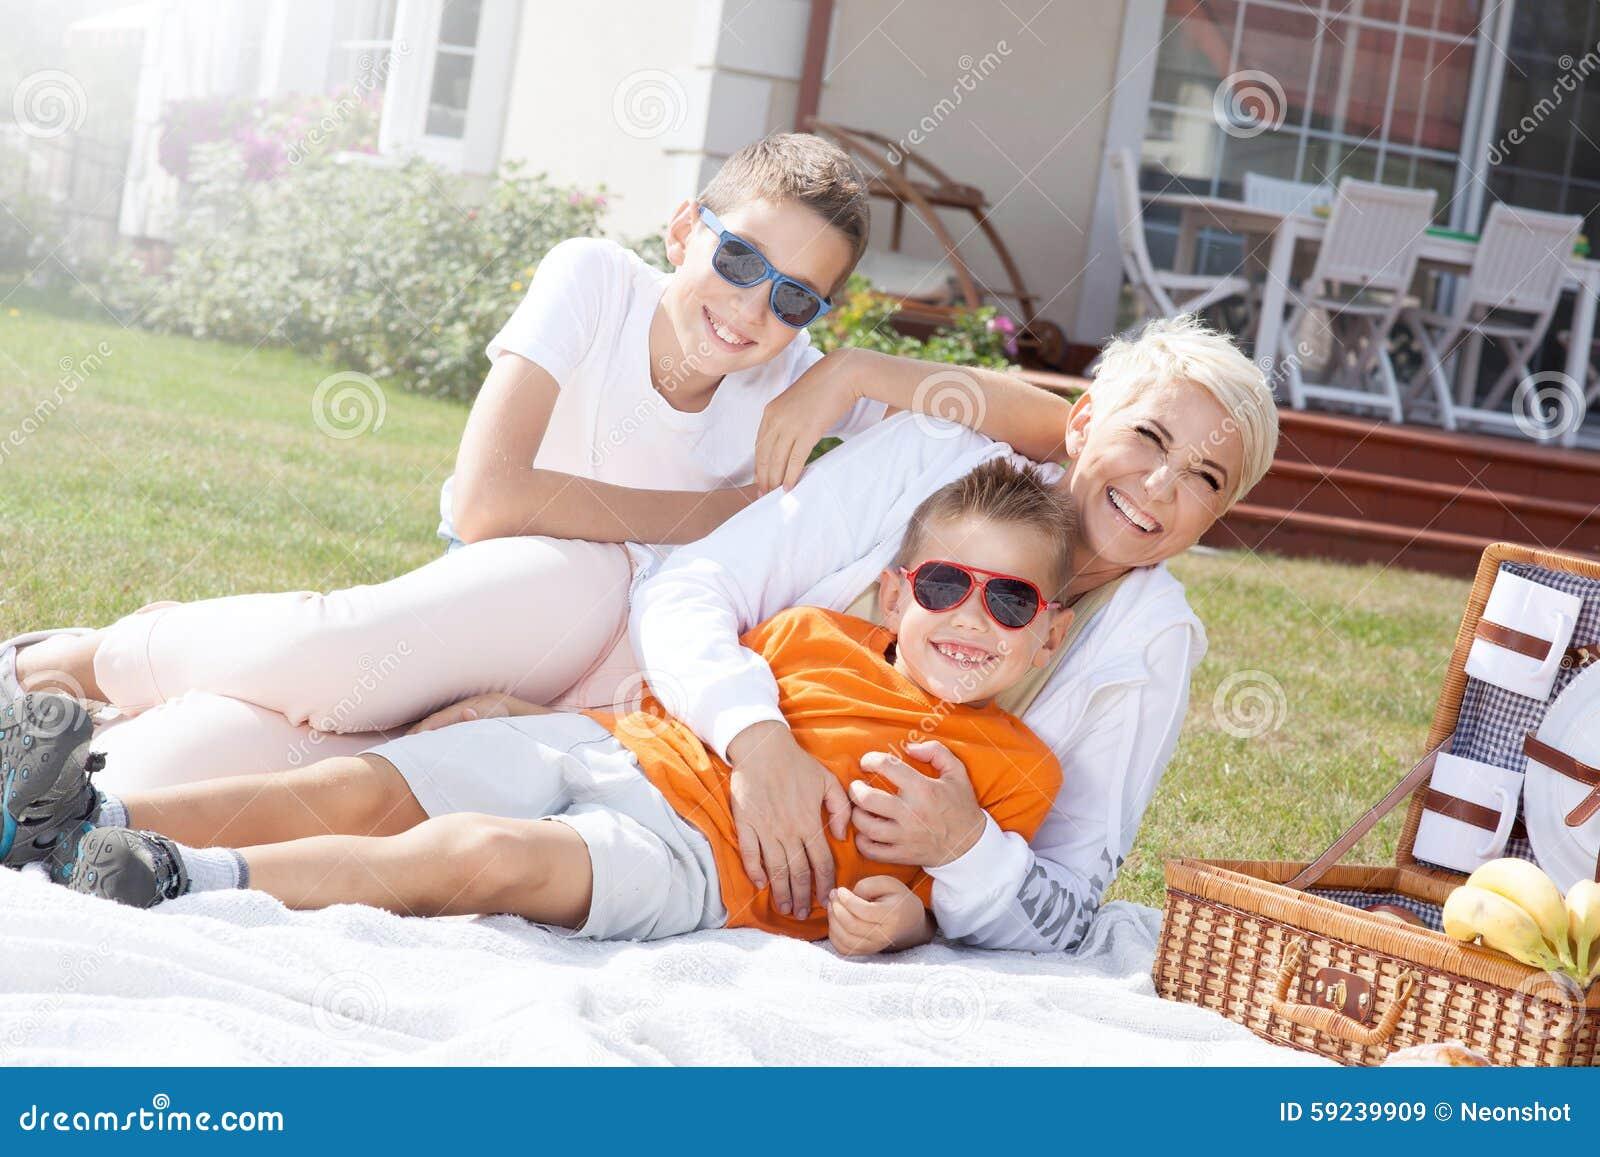 Download Comida Campestre De La Familia Imagen de archivo - Imagen de caucásico, lifestyle: 59239909